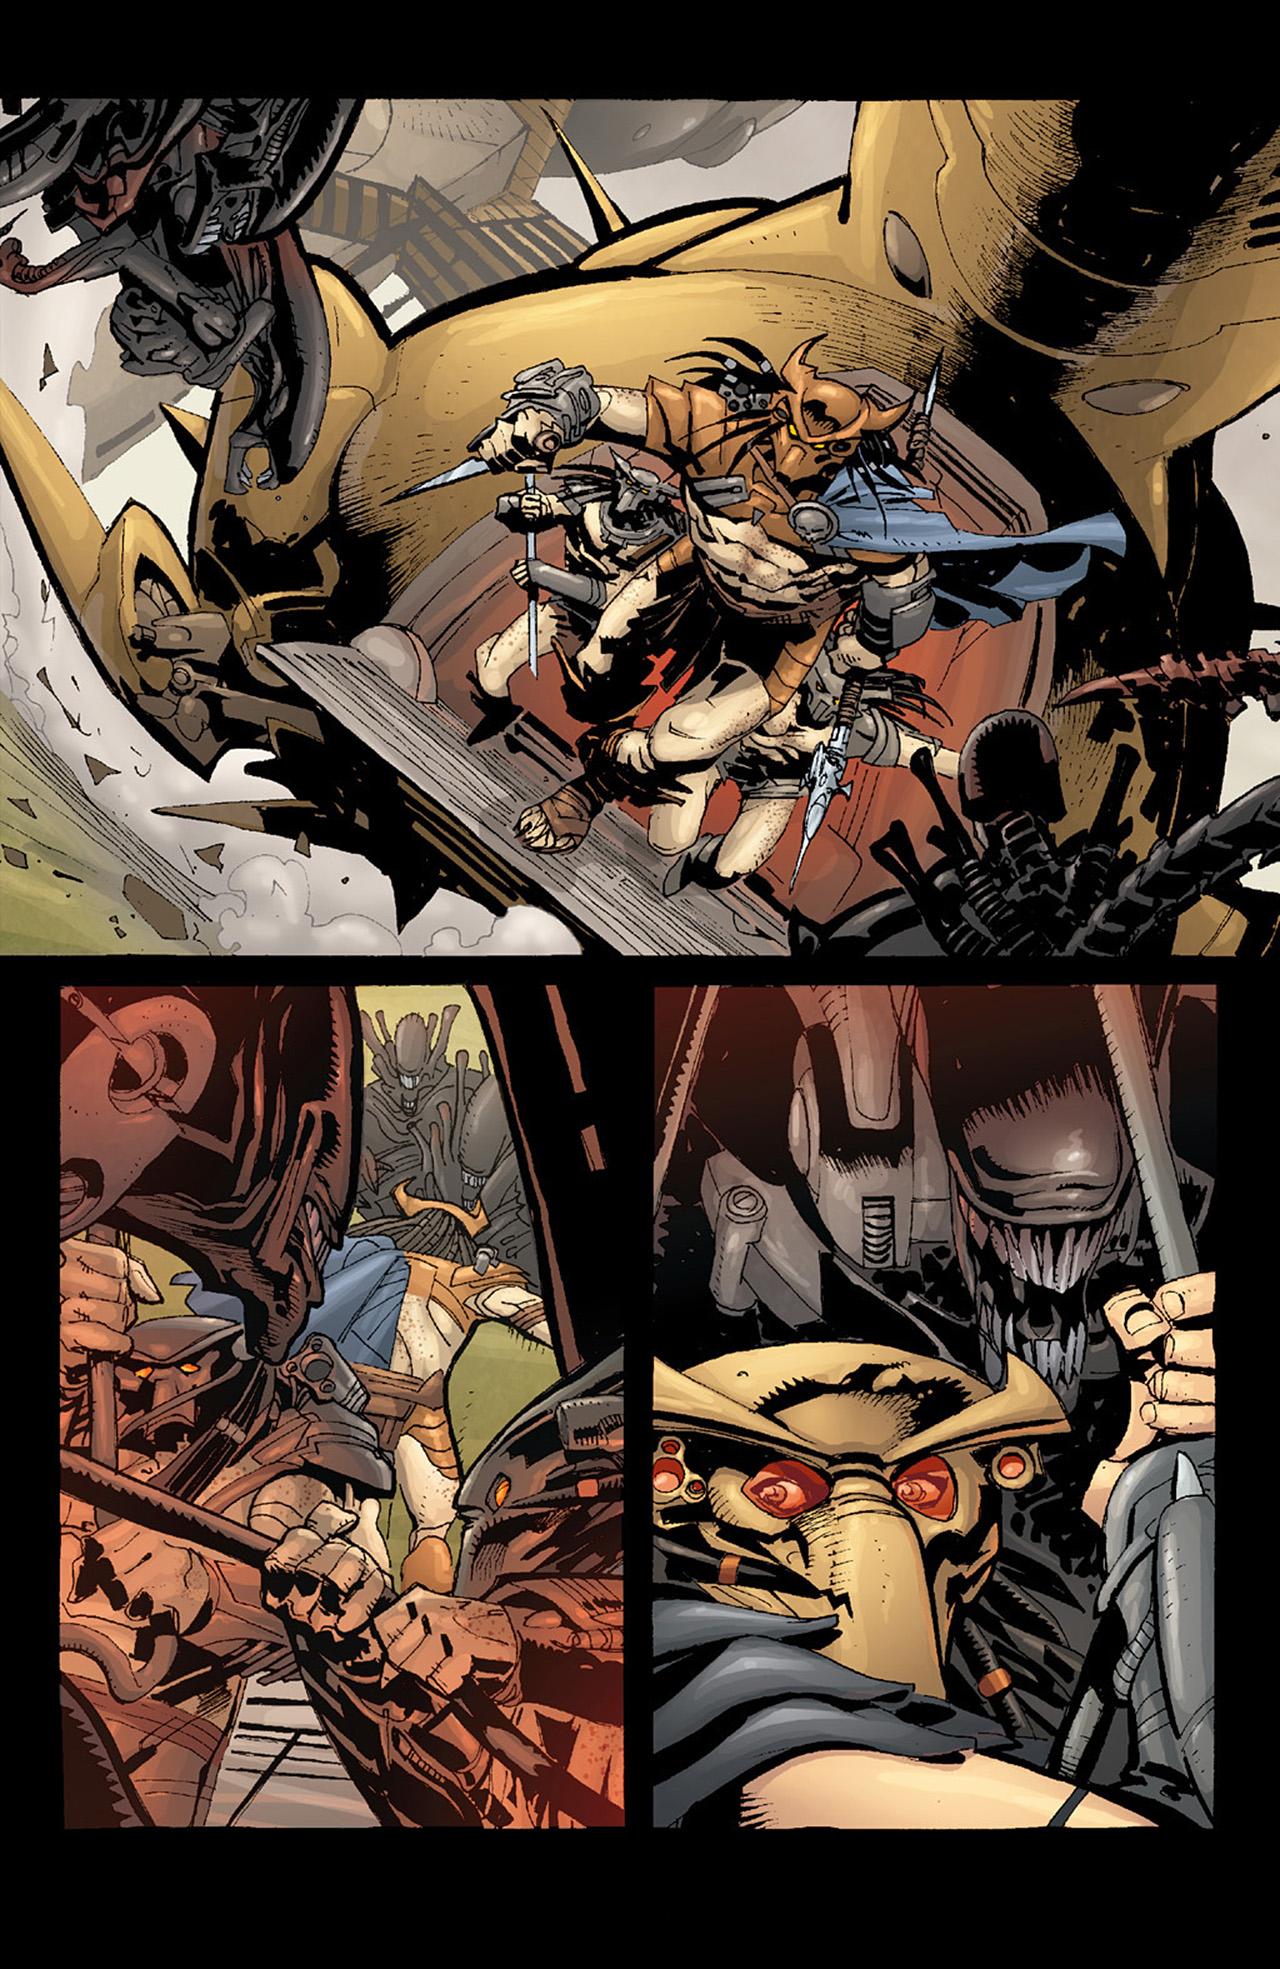 Read online Aliens vs. Predator: Three World War comic -  Issue #6 - 11